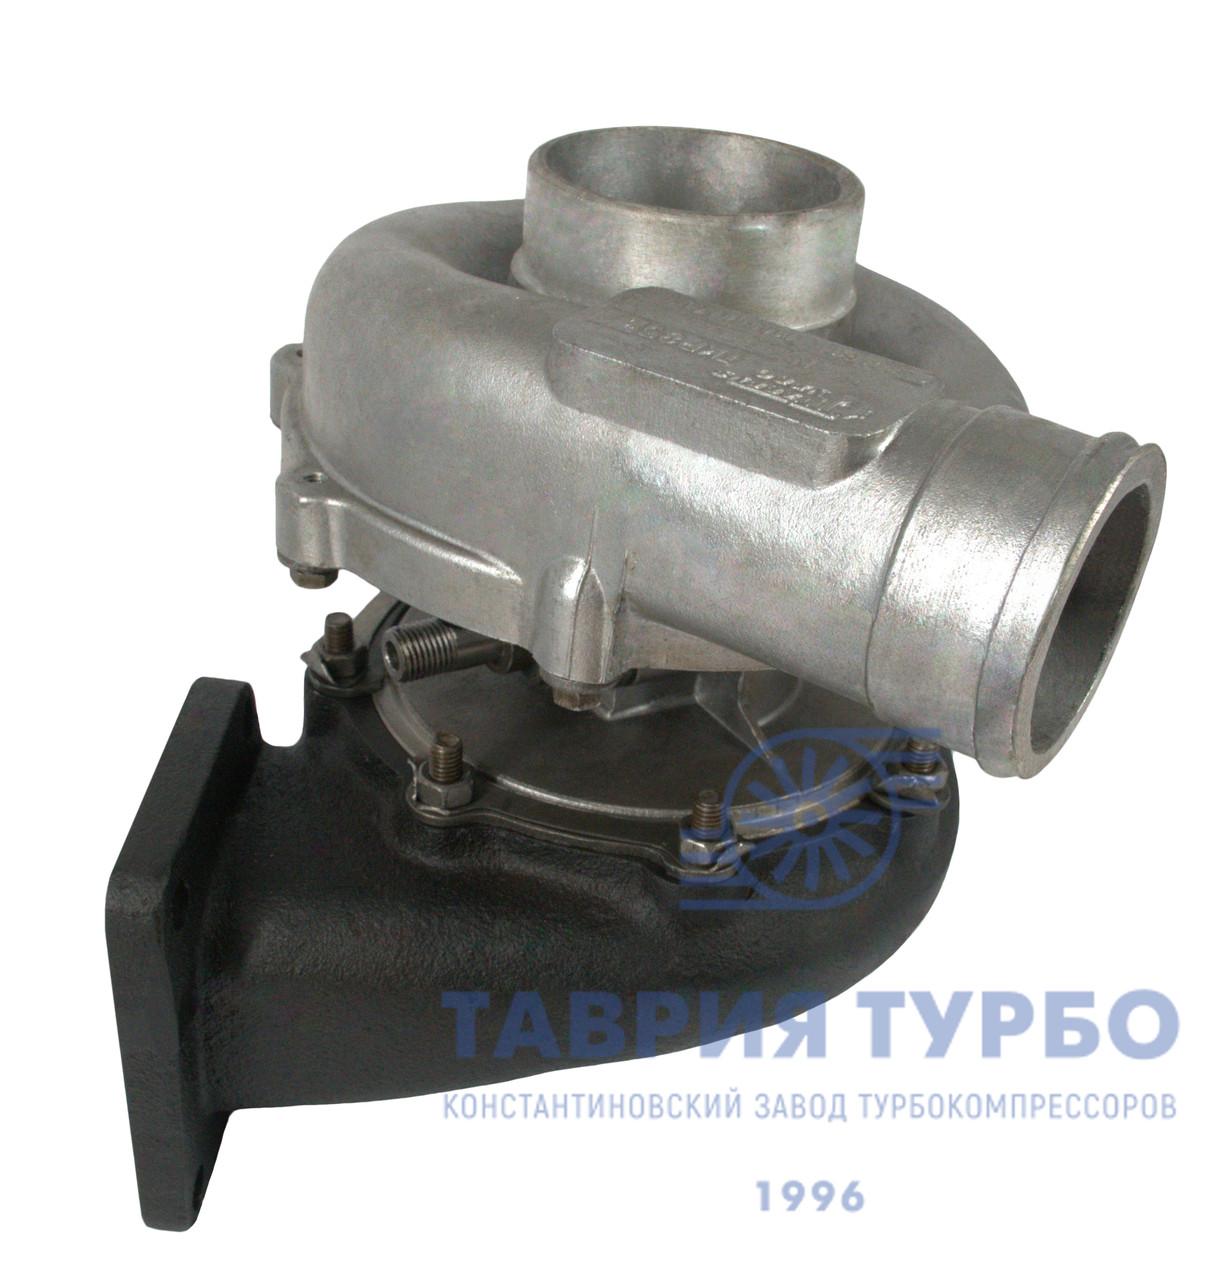 Турбокомпрессор ТКР 8,5C6 , Турбина на Тракторы ДТ-75Д, Т-90П; Двигатель Д-440, Д-442